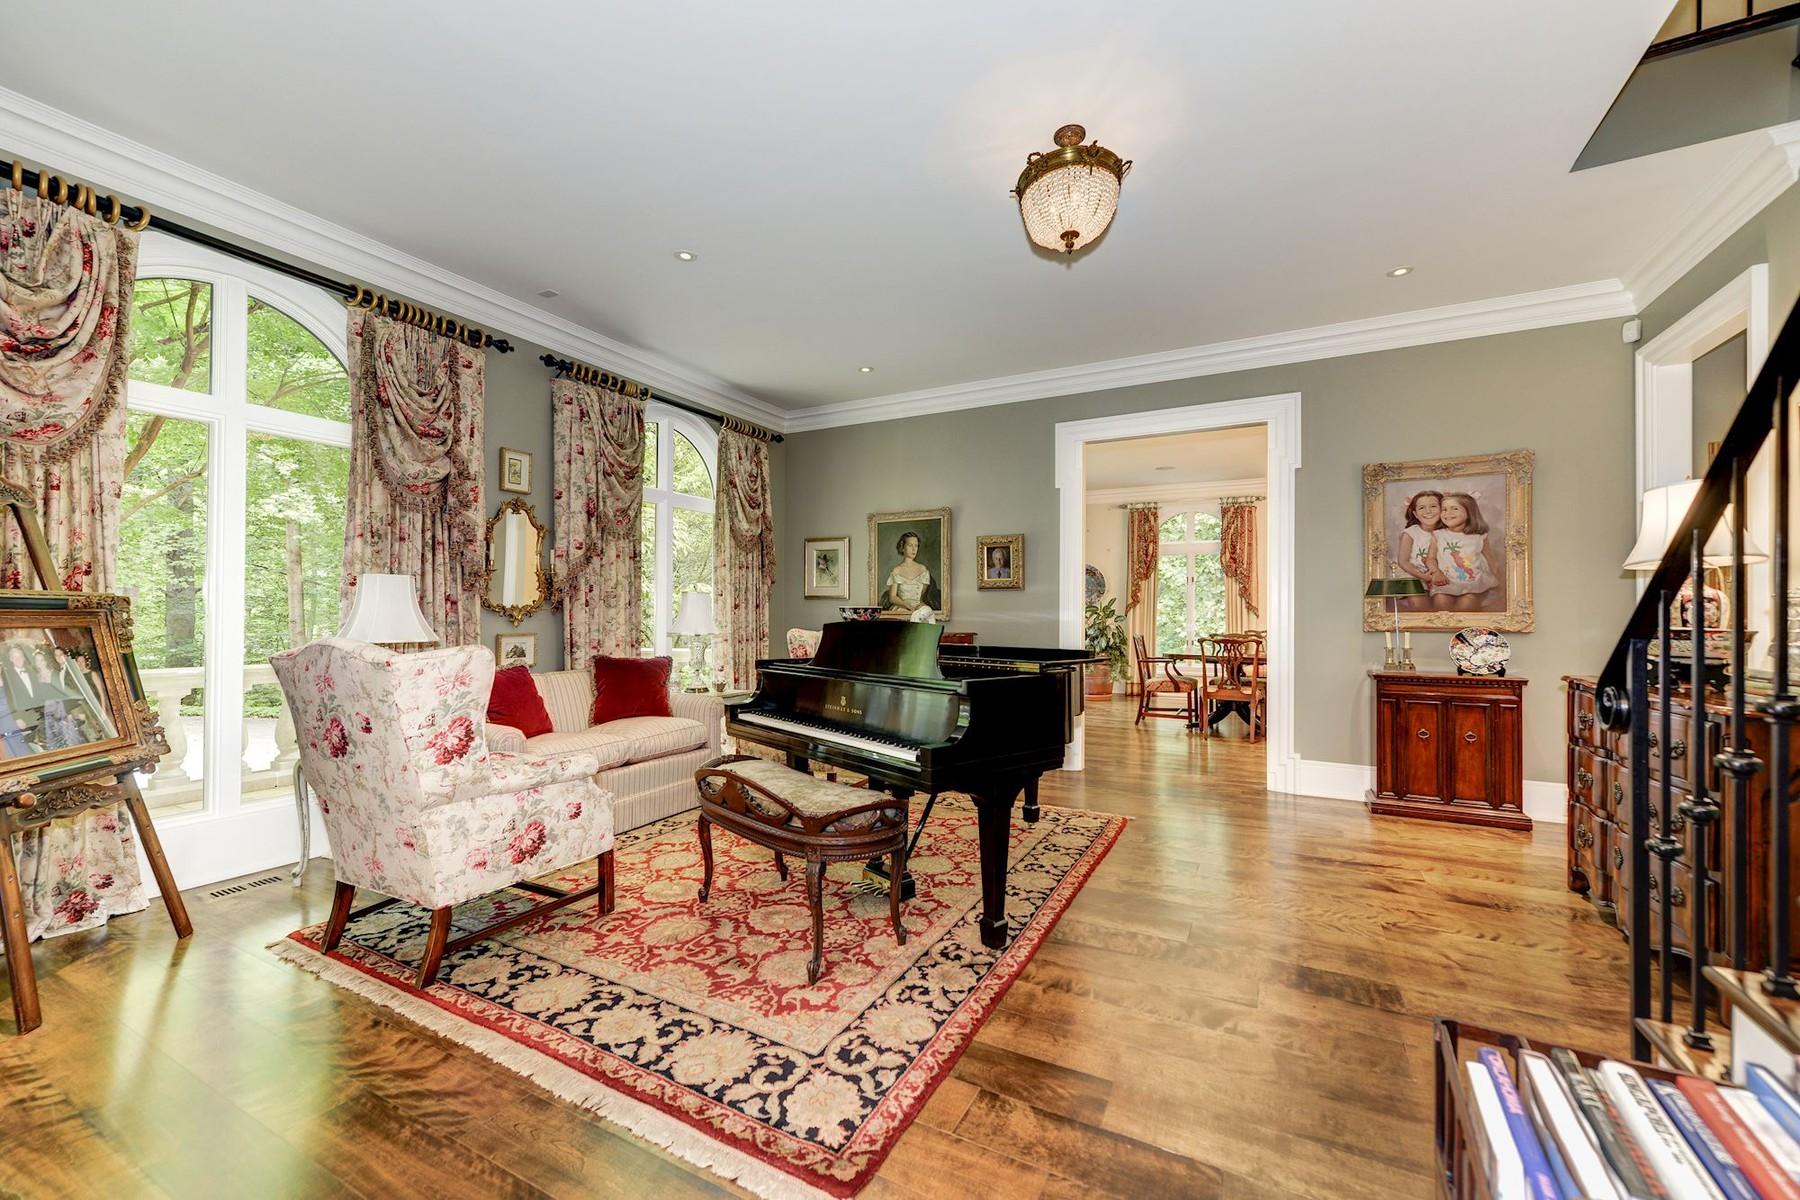 Additional photo for property listing at La Maison 1111 Crest Lane McLean, Βιρτζινια 22101 Ηνωμενεσ Πολιτειεσ